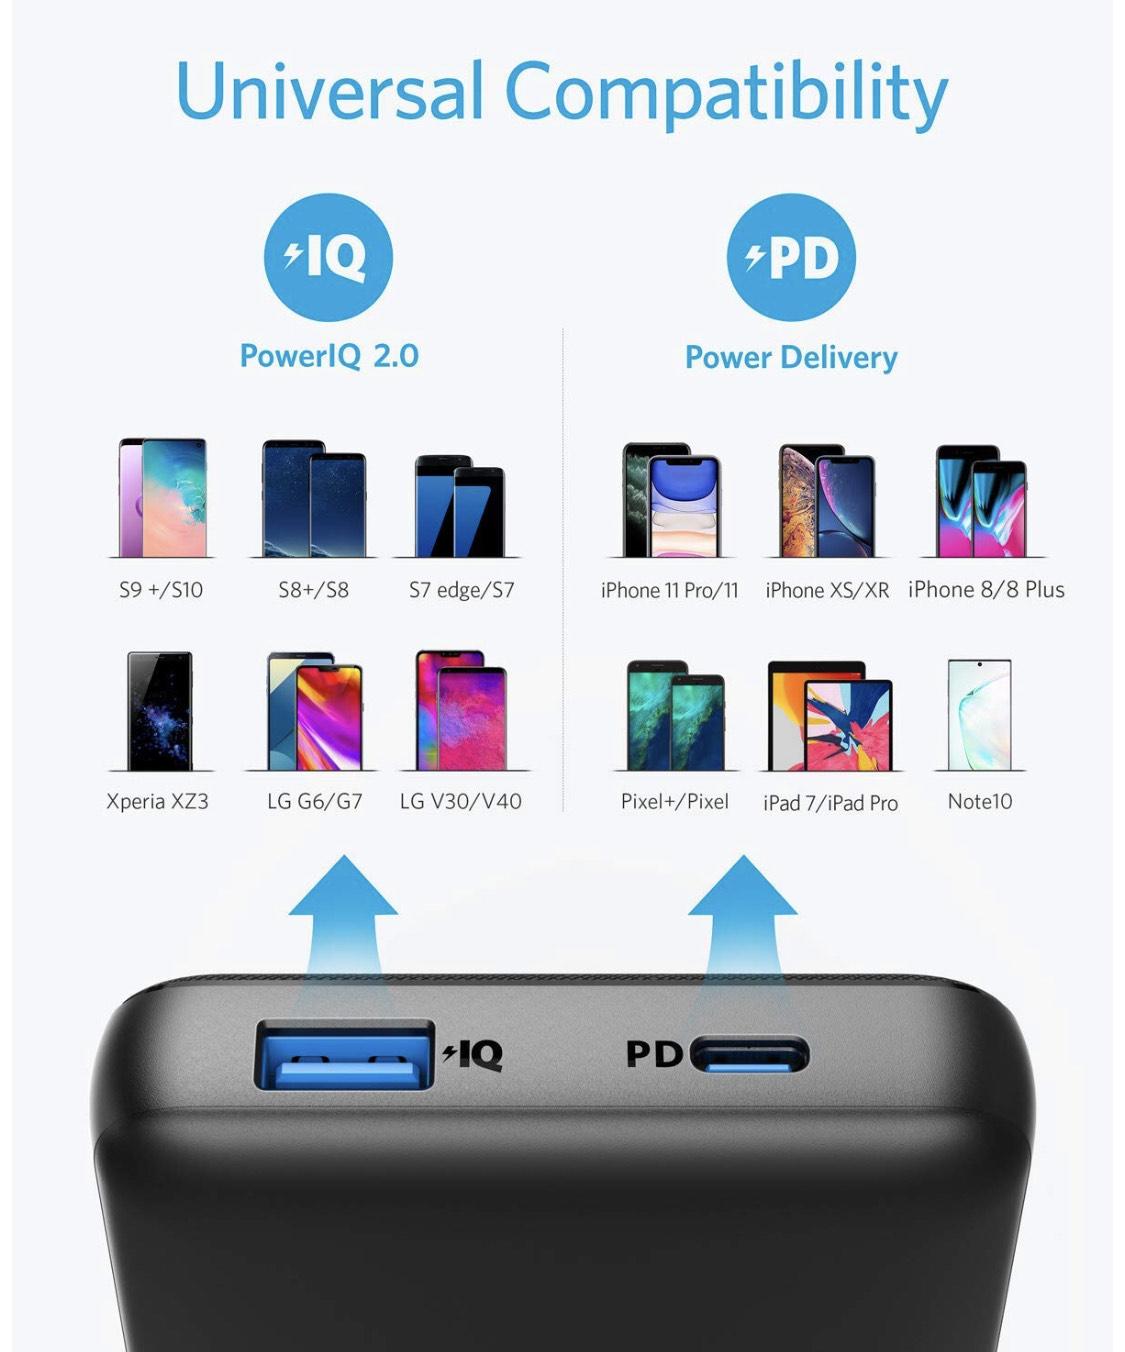 Anker PowerCore Essential 20000 PD externer Akku, 20000mAh USB-C Powerbank mit 18W Power Delivery, enorme Kapazität